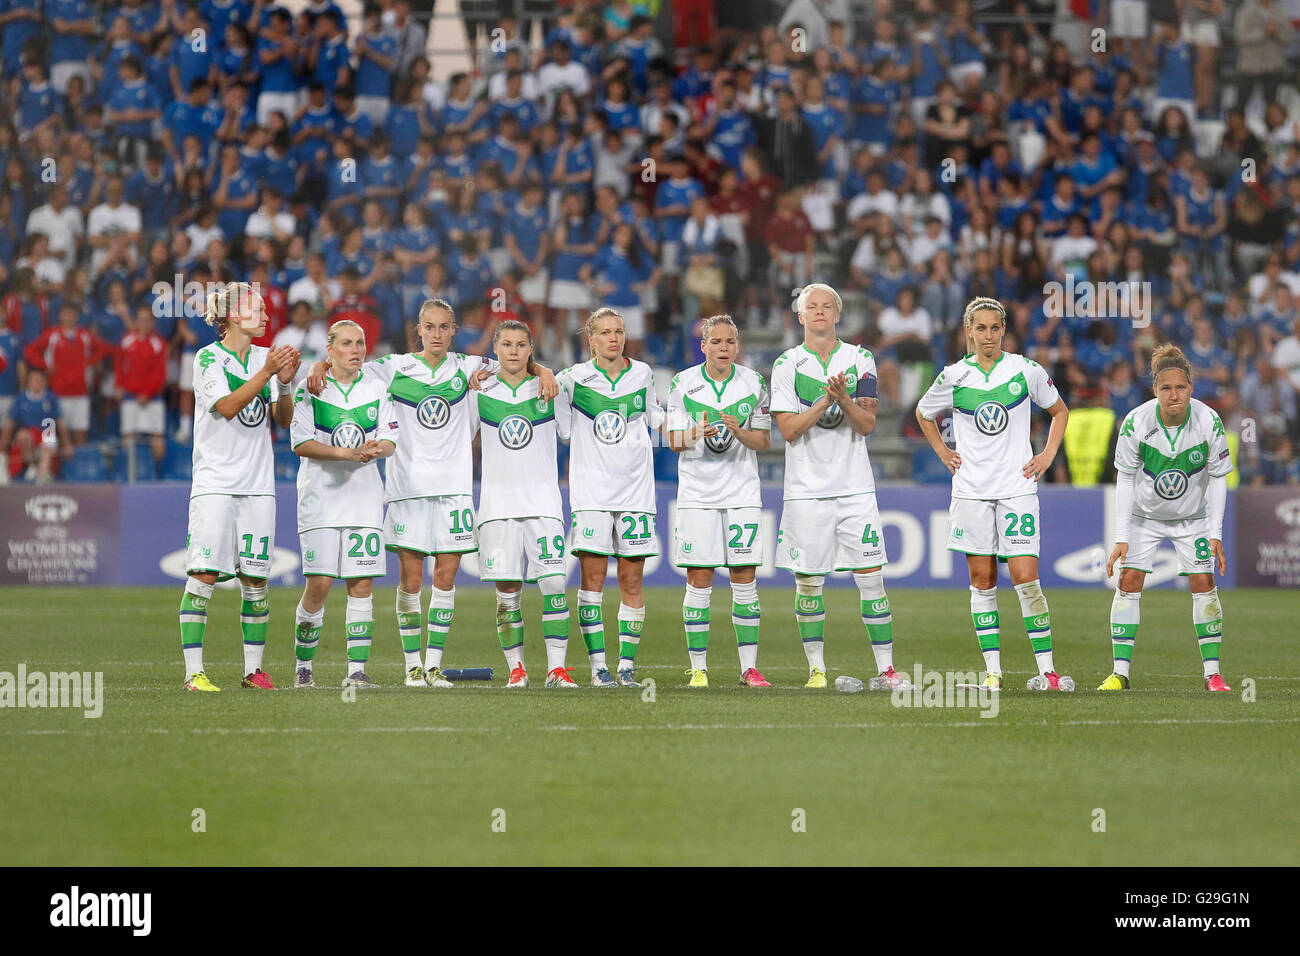 26.05.2016. Stadio Citta del Tricolore, Reggio, Italy. UEFA Womens Champions League Final. Wolfsburg versus Lyon. - Stock Image